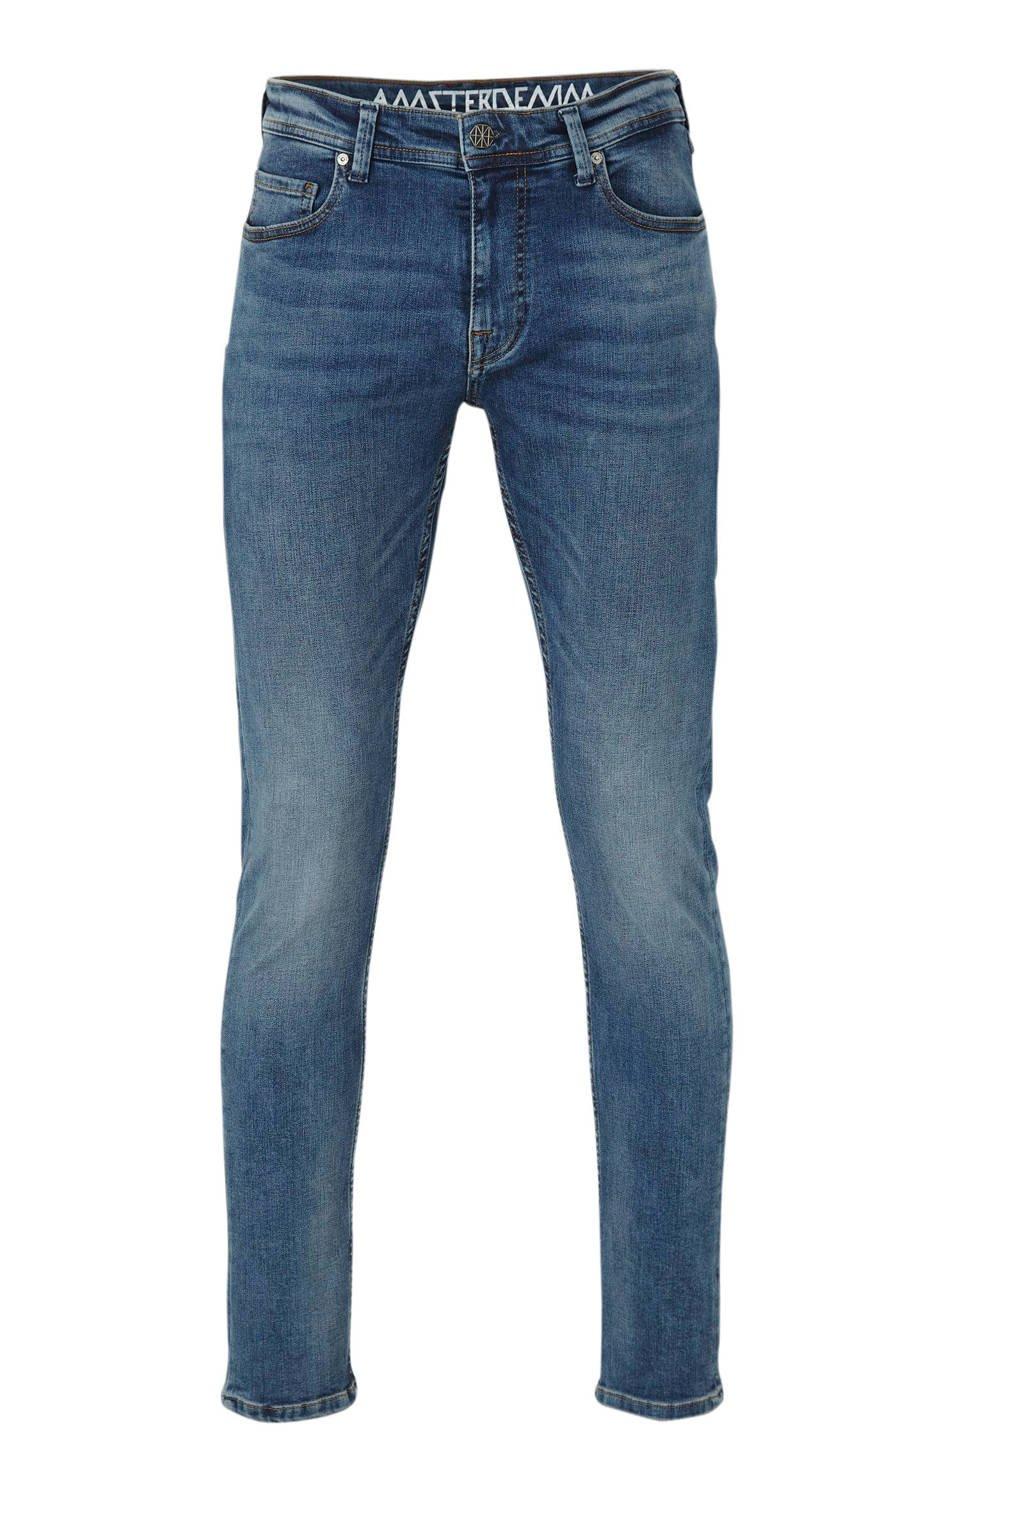 Amsterdenim straight fit jeans Jan, Oud blauw